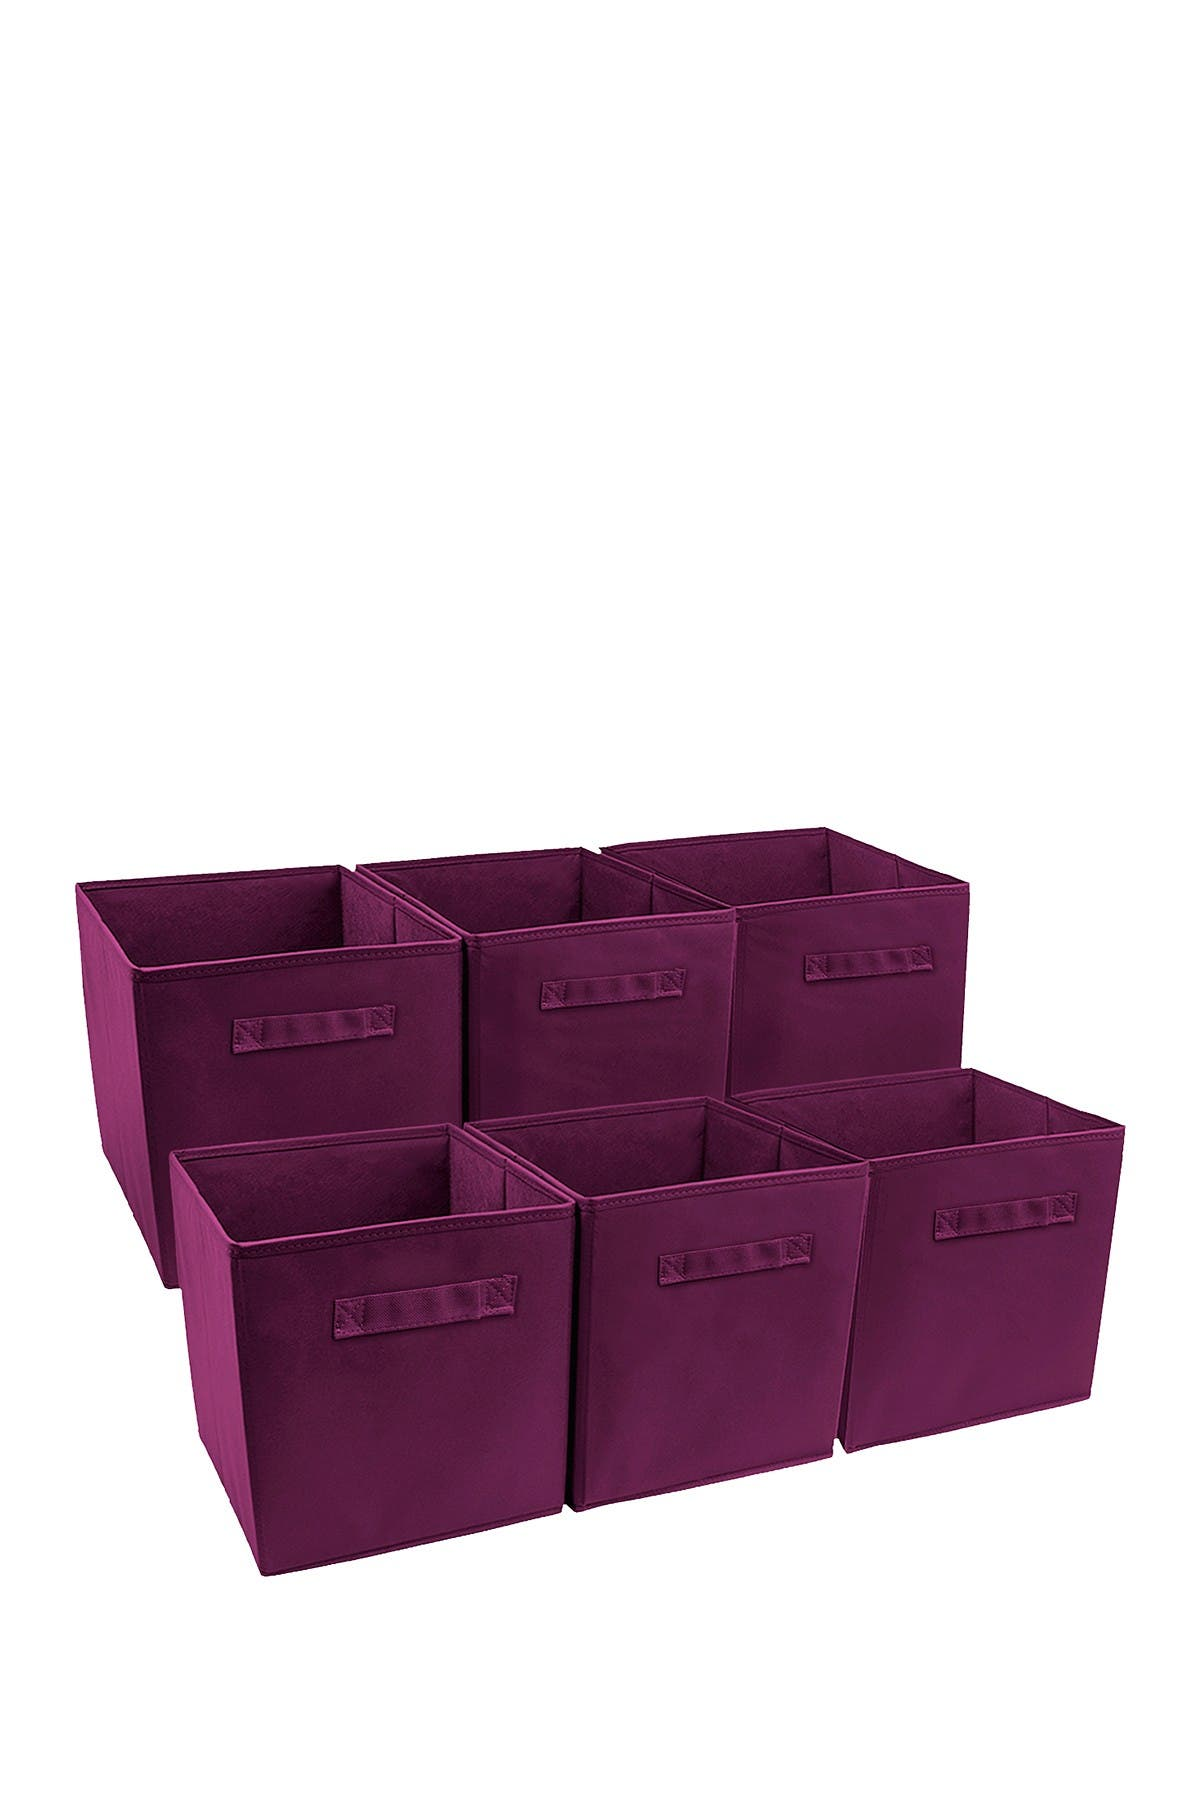 Image of Sorbus Purple Foldable Storage Cube Basket Bin - Pack of 6